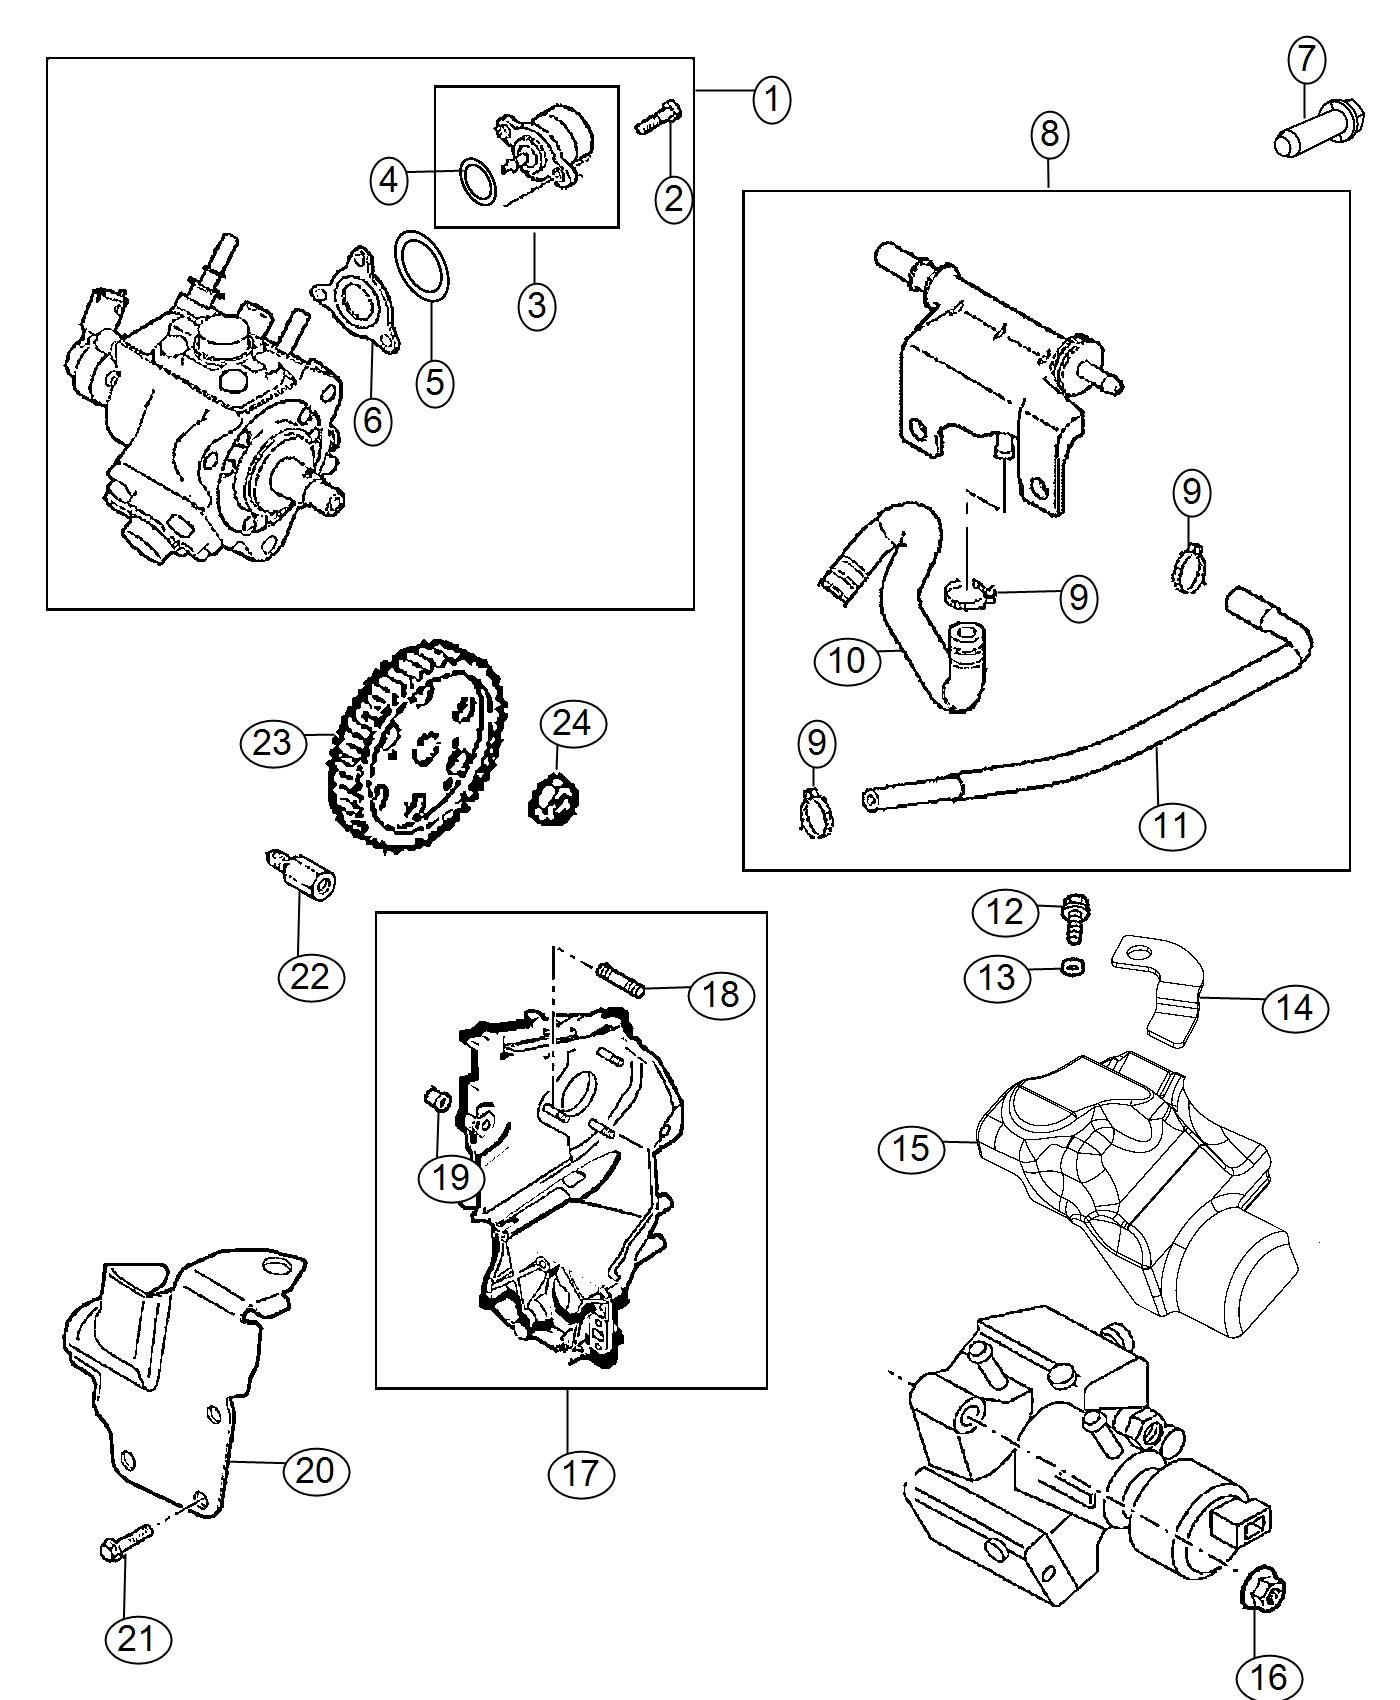 Jeep Cherokee Pump Fuel Injection Engine